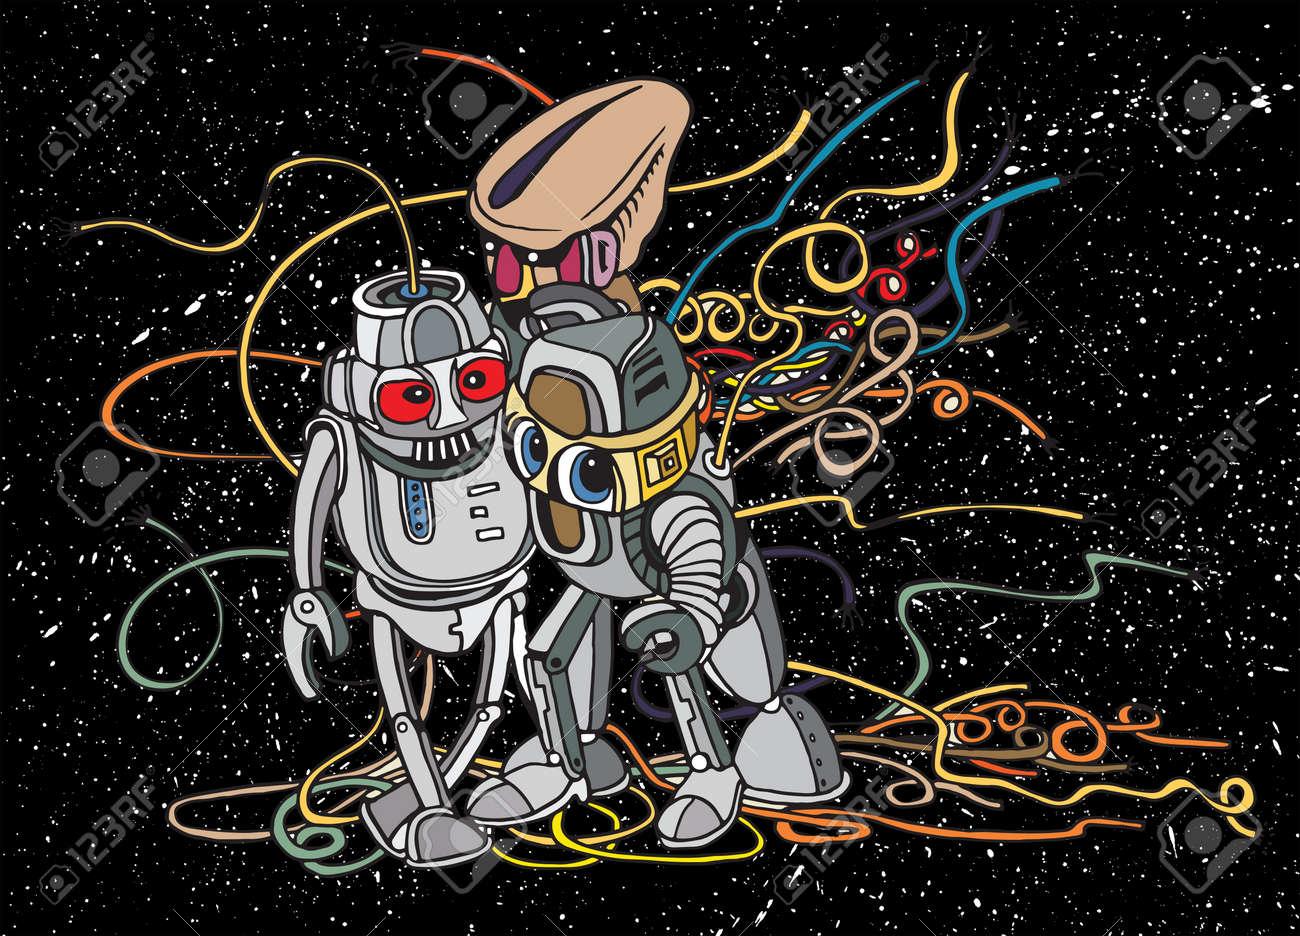 Line Art Vector Illustrator : Hand drawn vector illustration of doodle robot illustrator line